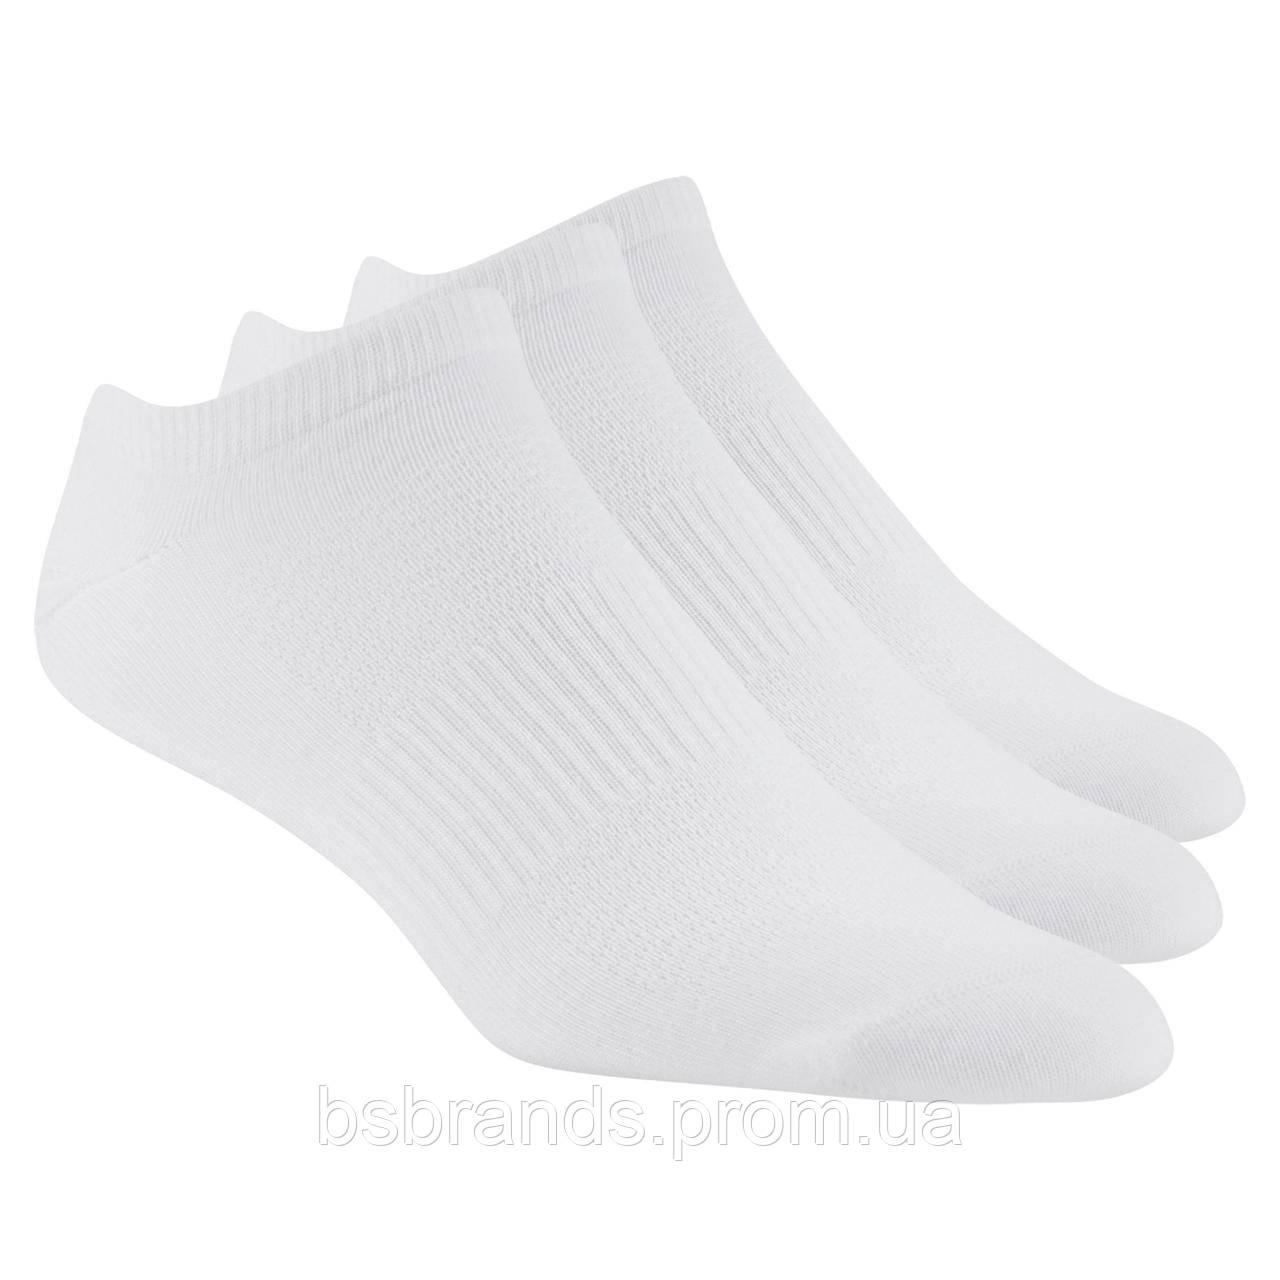 Спортивные носки Reebok CrossFit Mens Inside Thin CZ9951 (2020/1)